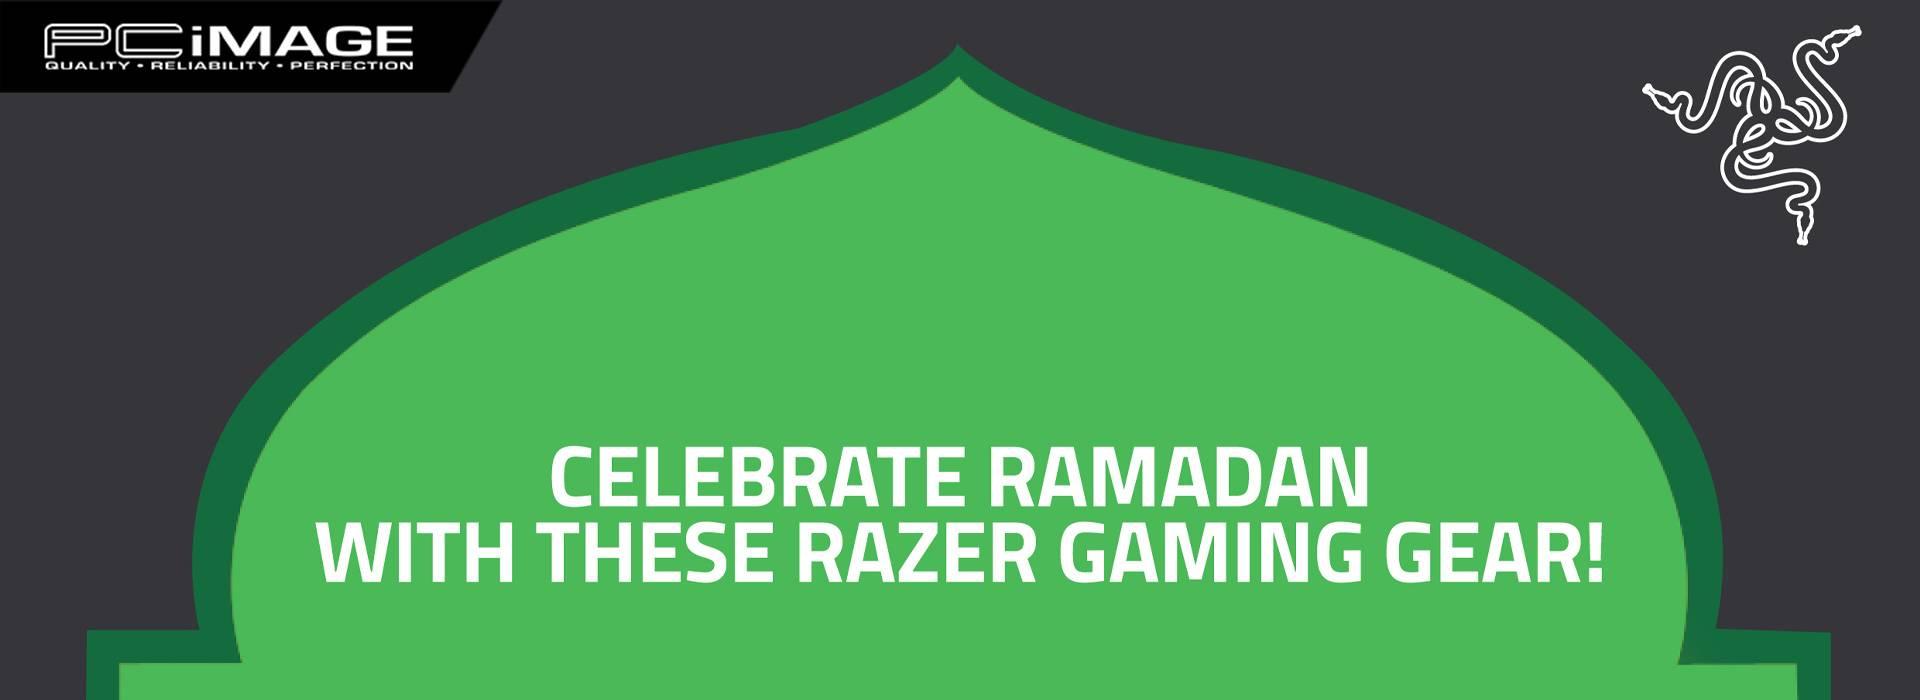 Razer April Ramadhan 2021 Promotion 30 Apr